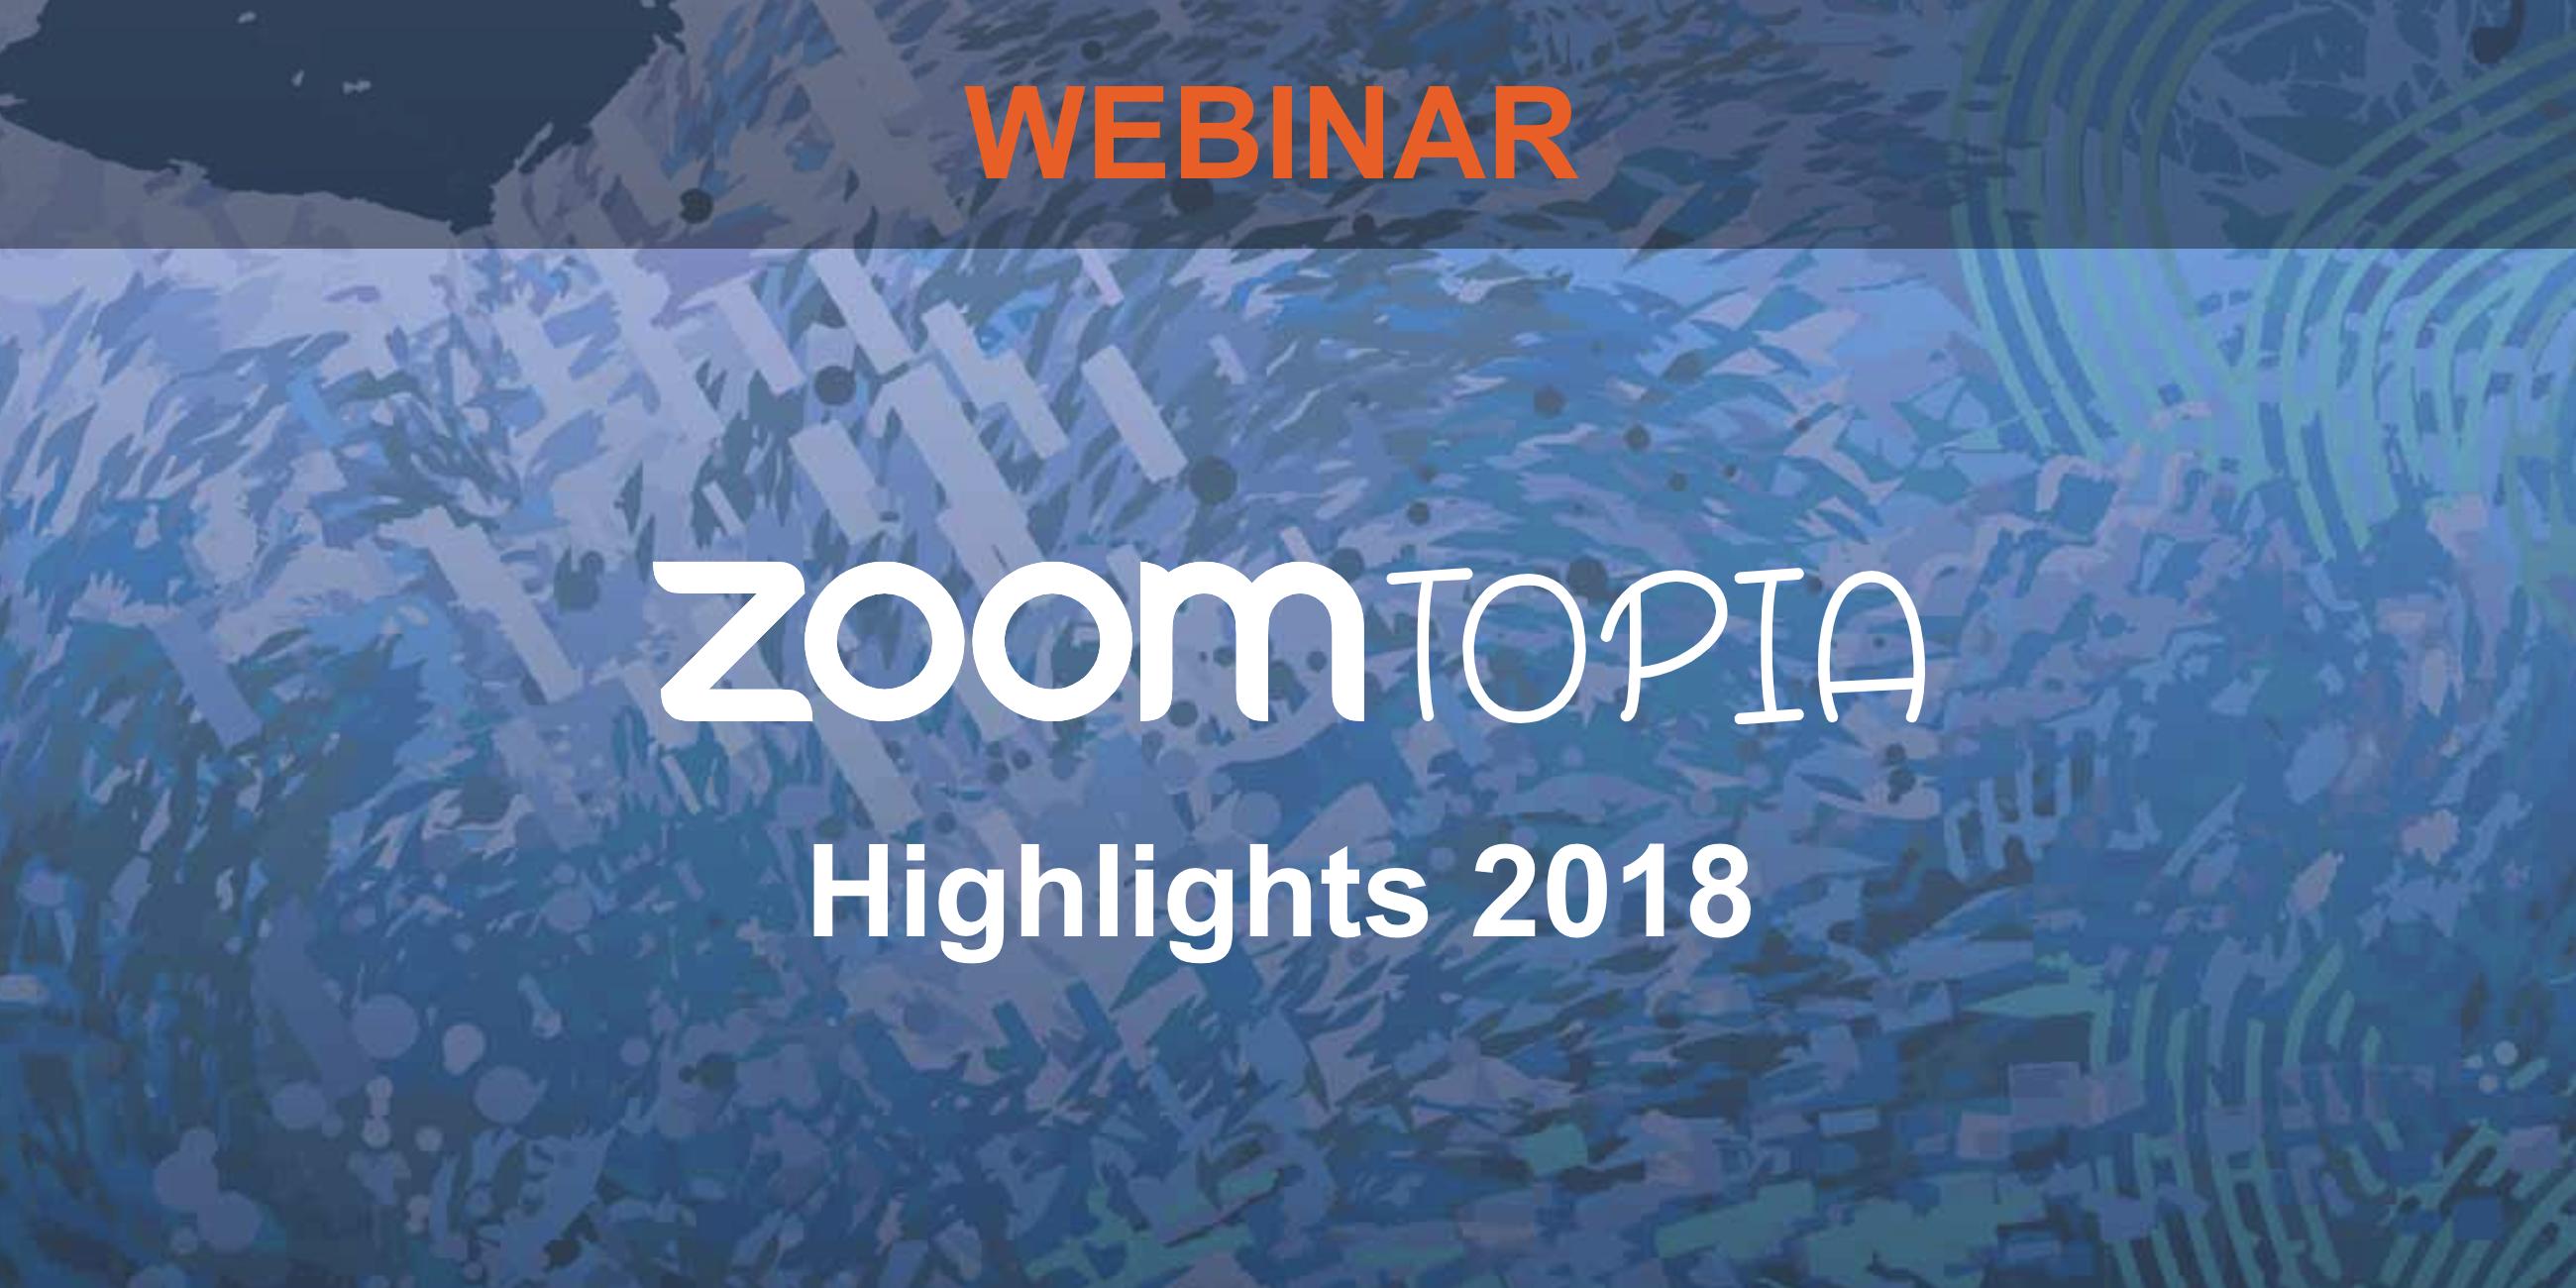 Zoomtopia 2018 Highlights Webinar